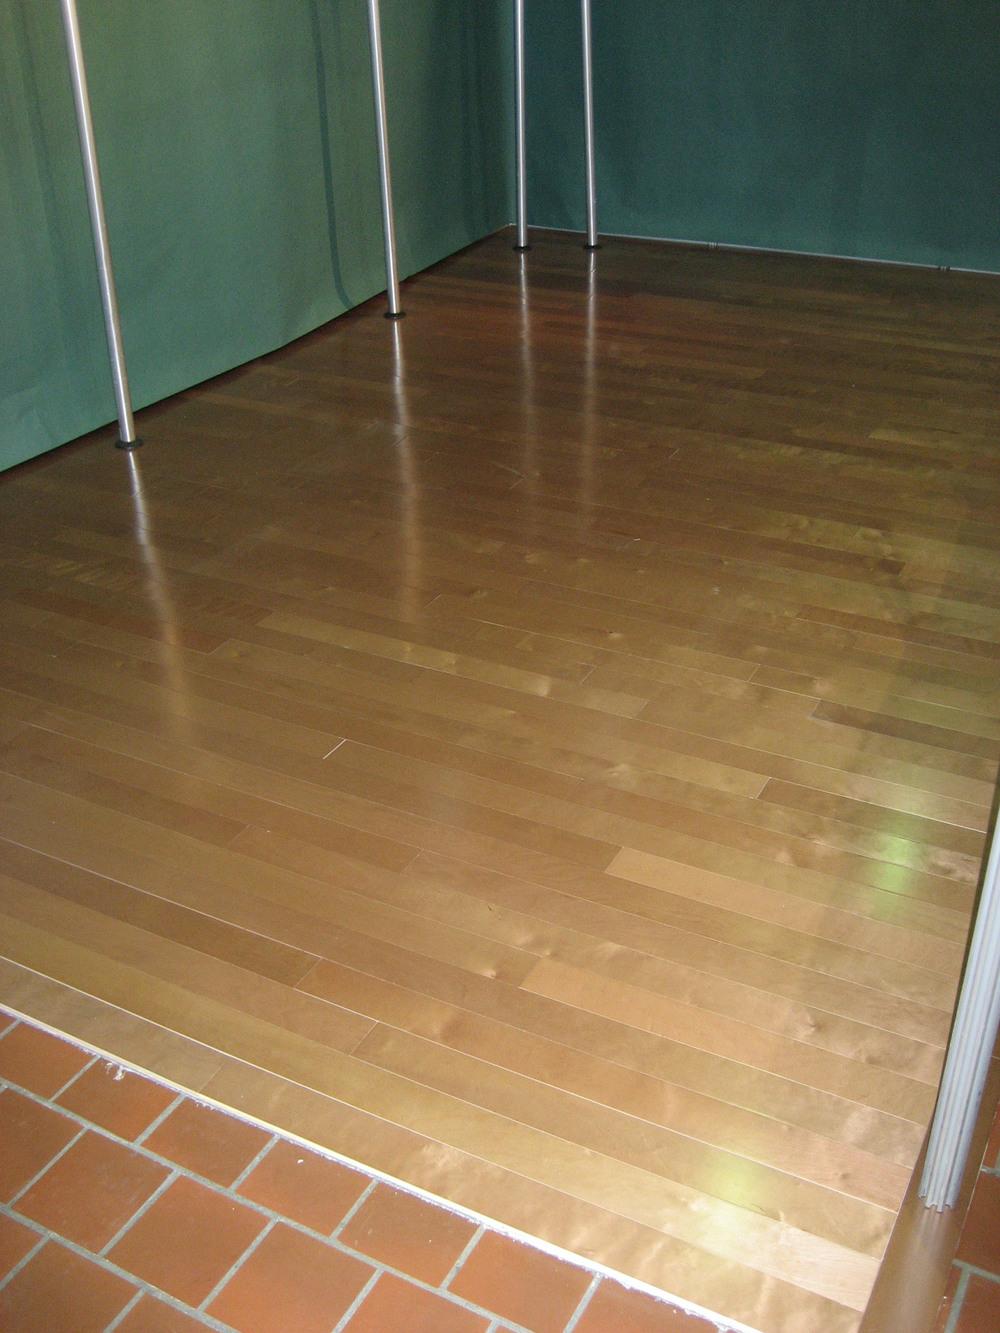 tradeshow-booth-flooring-b1.jpg